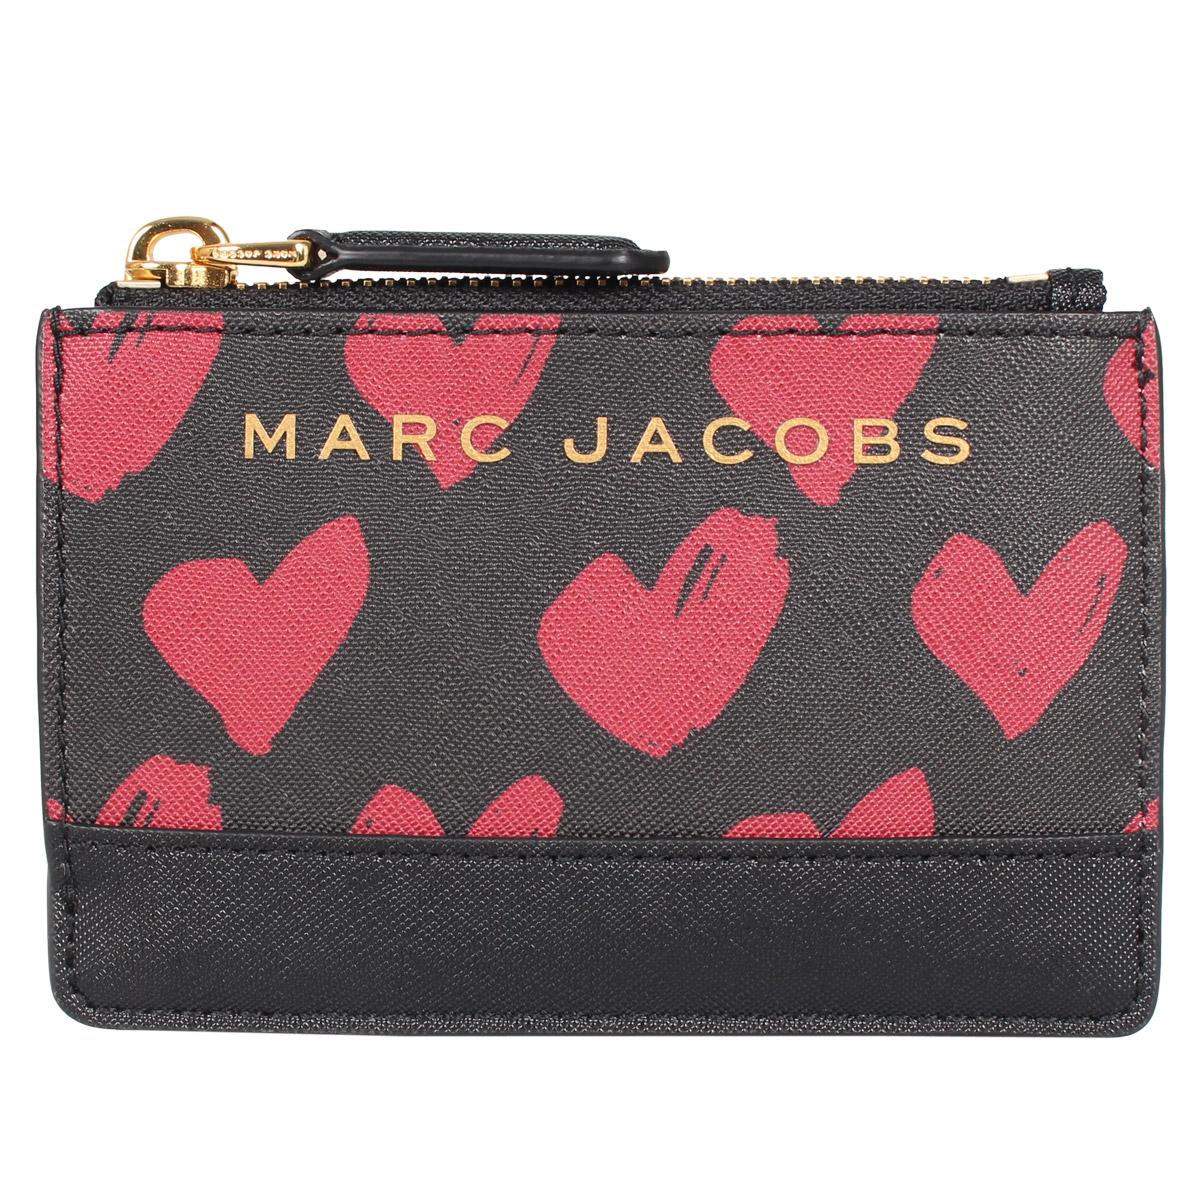 MARC JACOBS CARD CASE マークジェイコブス パスケース カードケース ID 定期入れ 小銭入れ キーケース レディース ブラック 黒 M0015719-962 [4/27 新入荷]